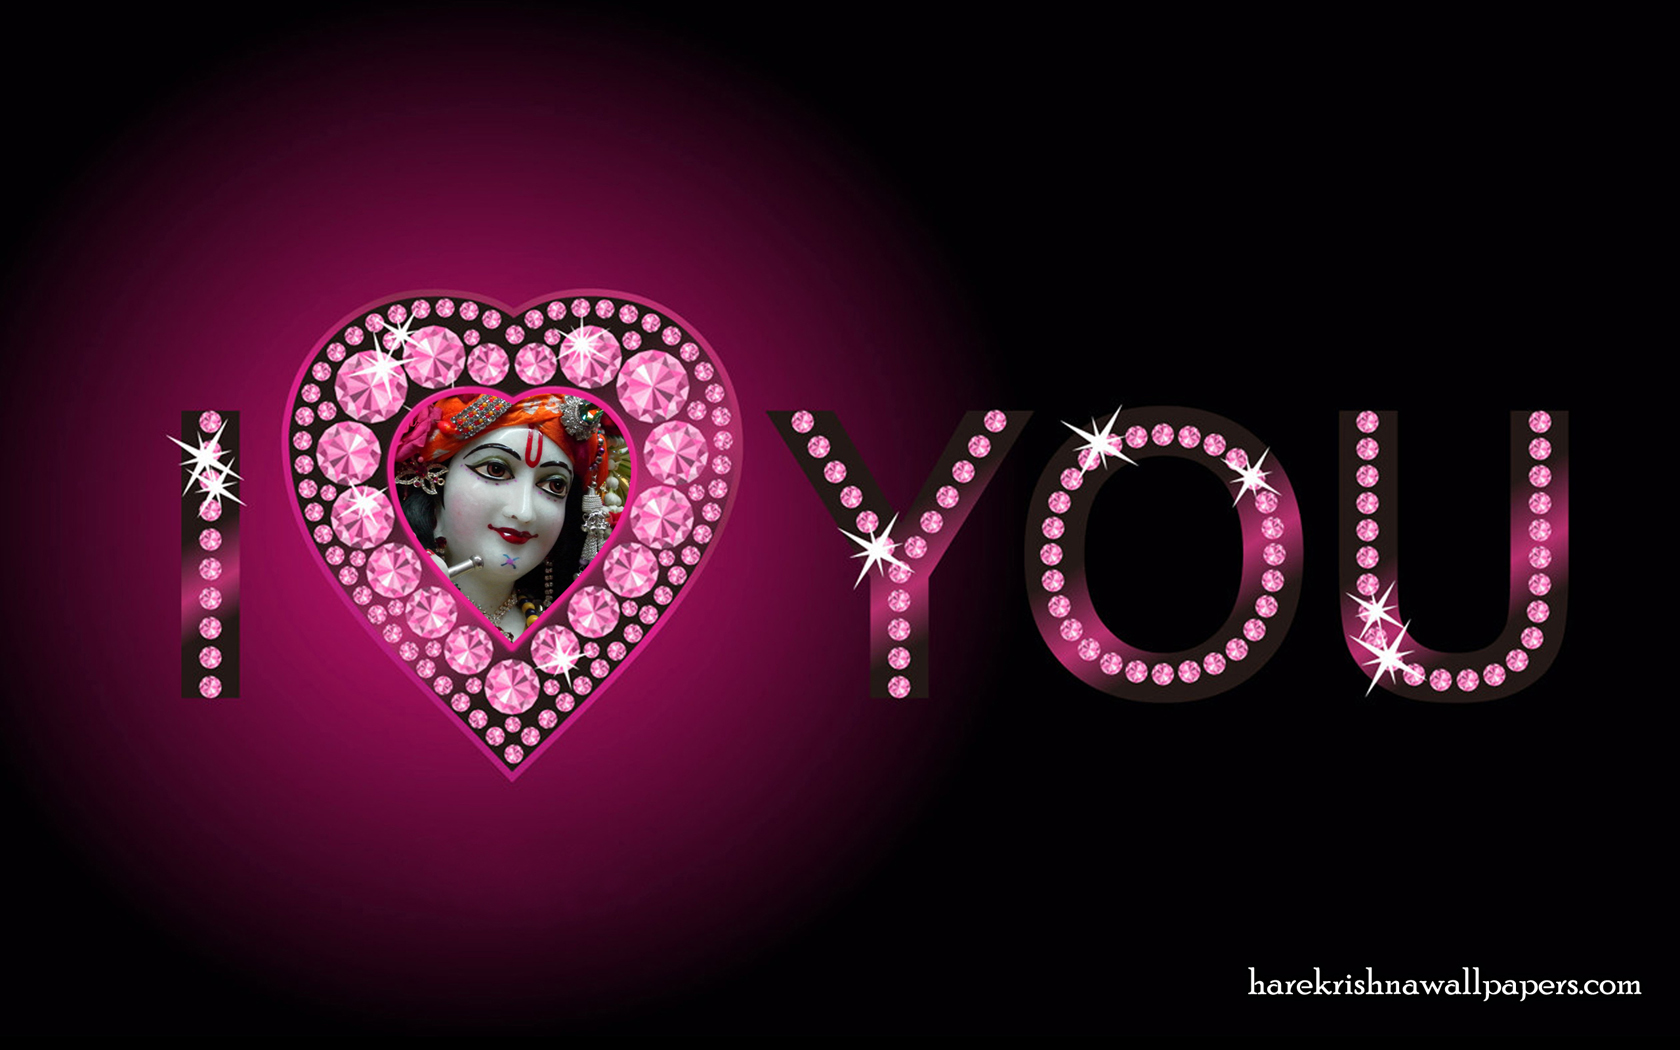 I Love You Giridhari Wallpaper (010) Size 1680x1050 Download